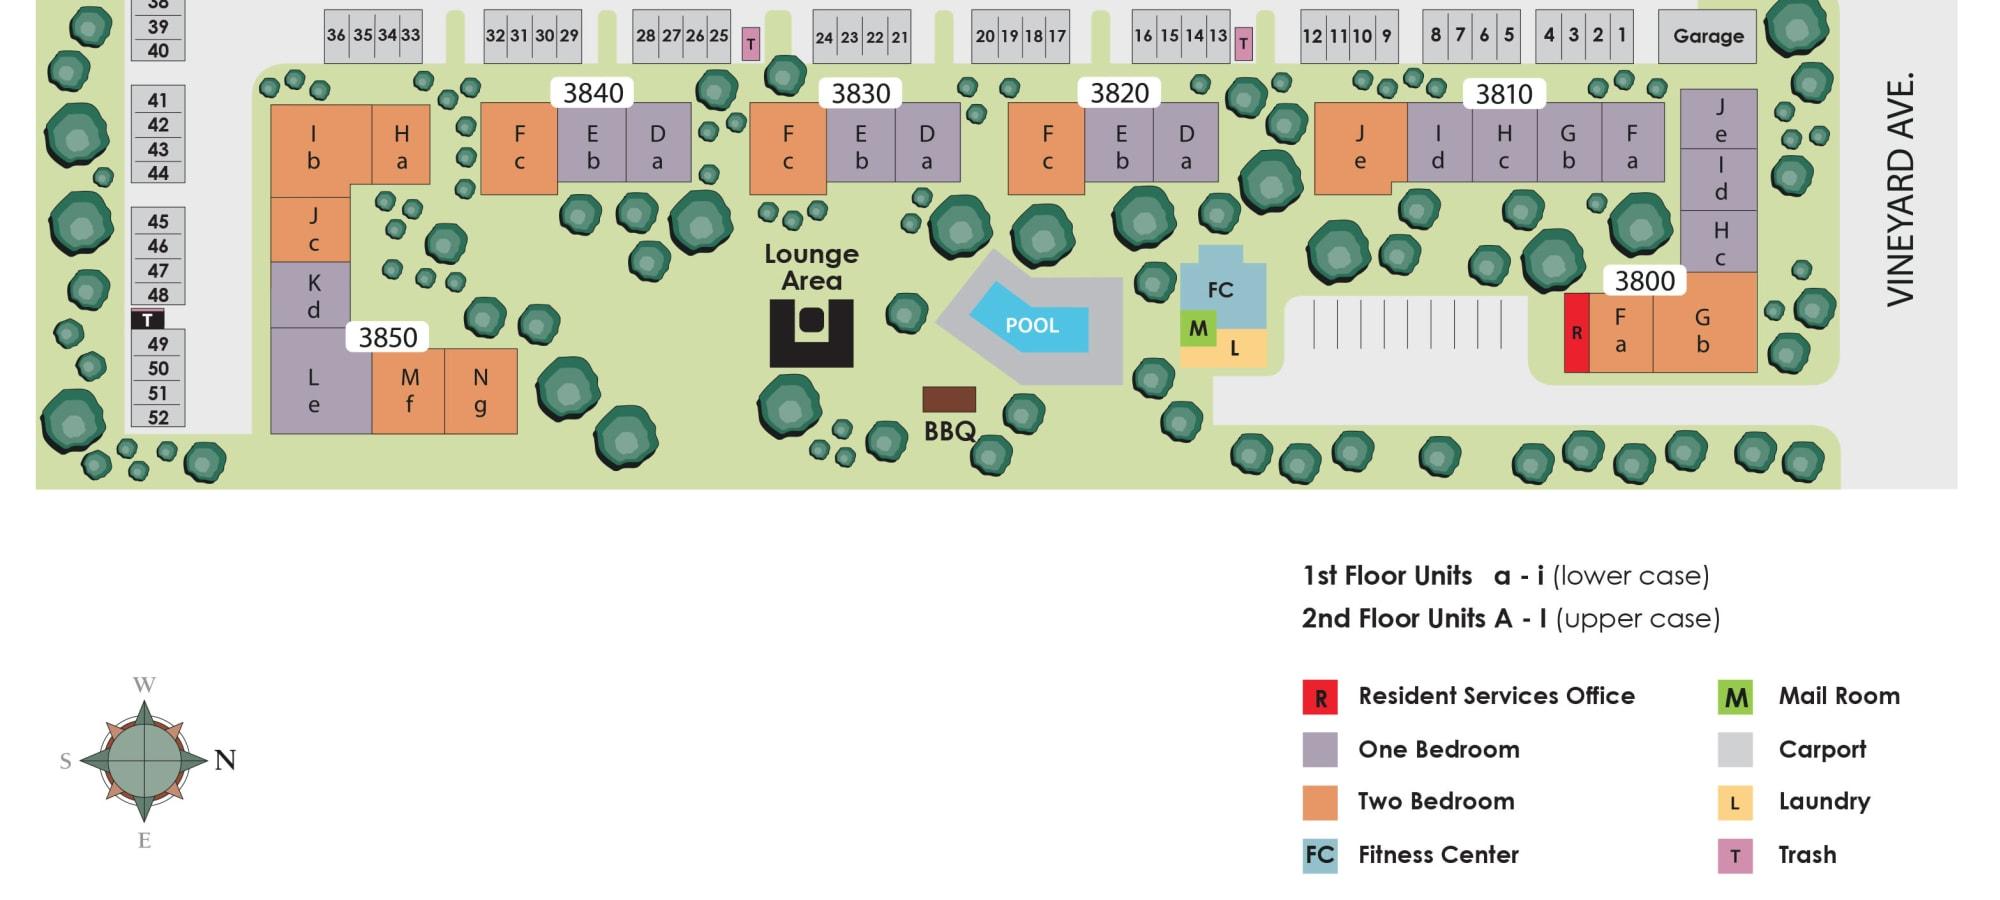 Site plan for Pleasanton Heights in Pleasanton, California